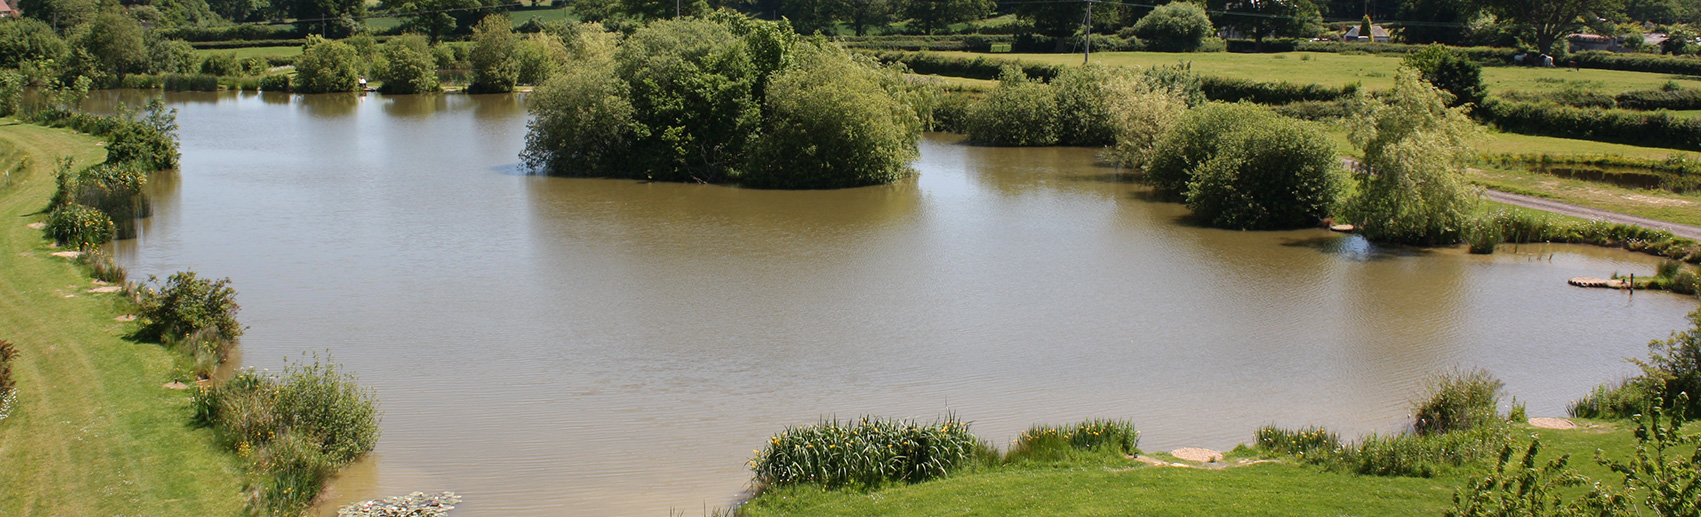 centre fishing lake - newdigate farms estate